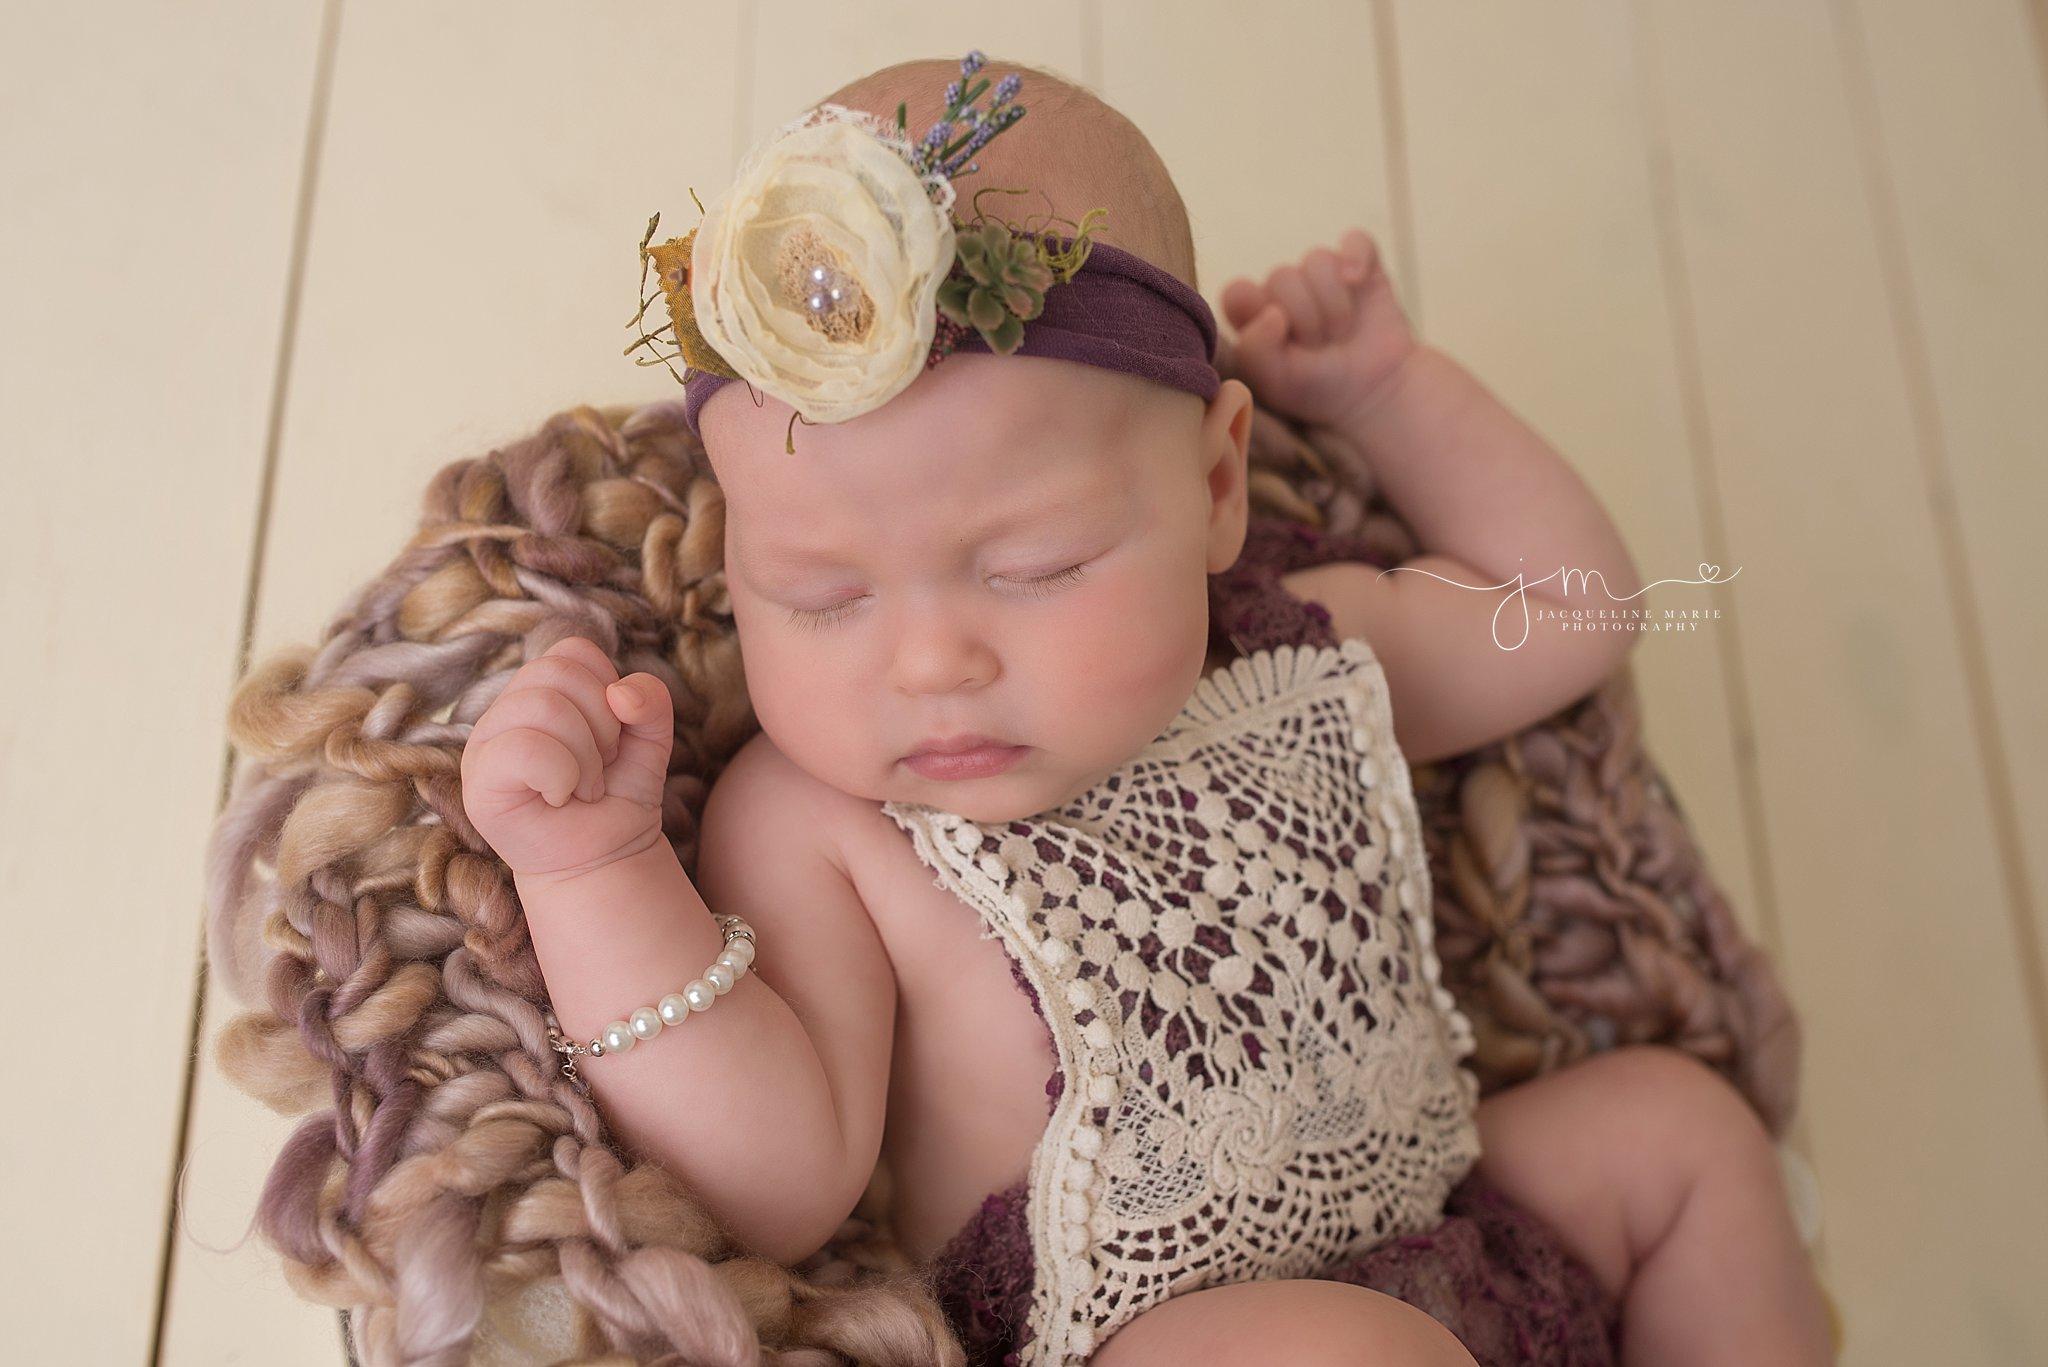 Jacqueline Marie Photography studio in Columbus Ohio features 3 month milestone baby portrait sleeping in white wood bucket